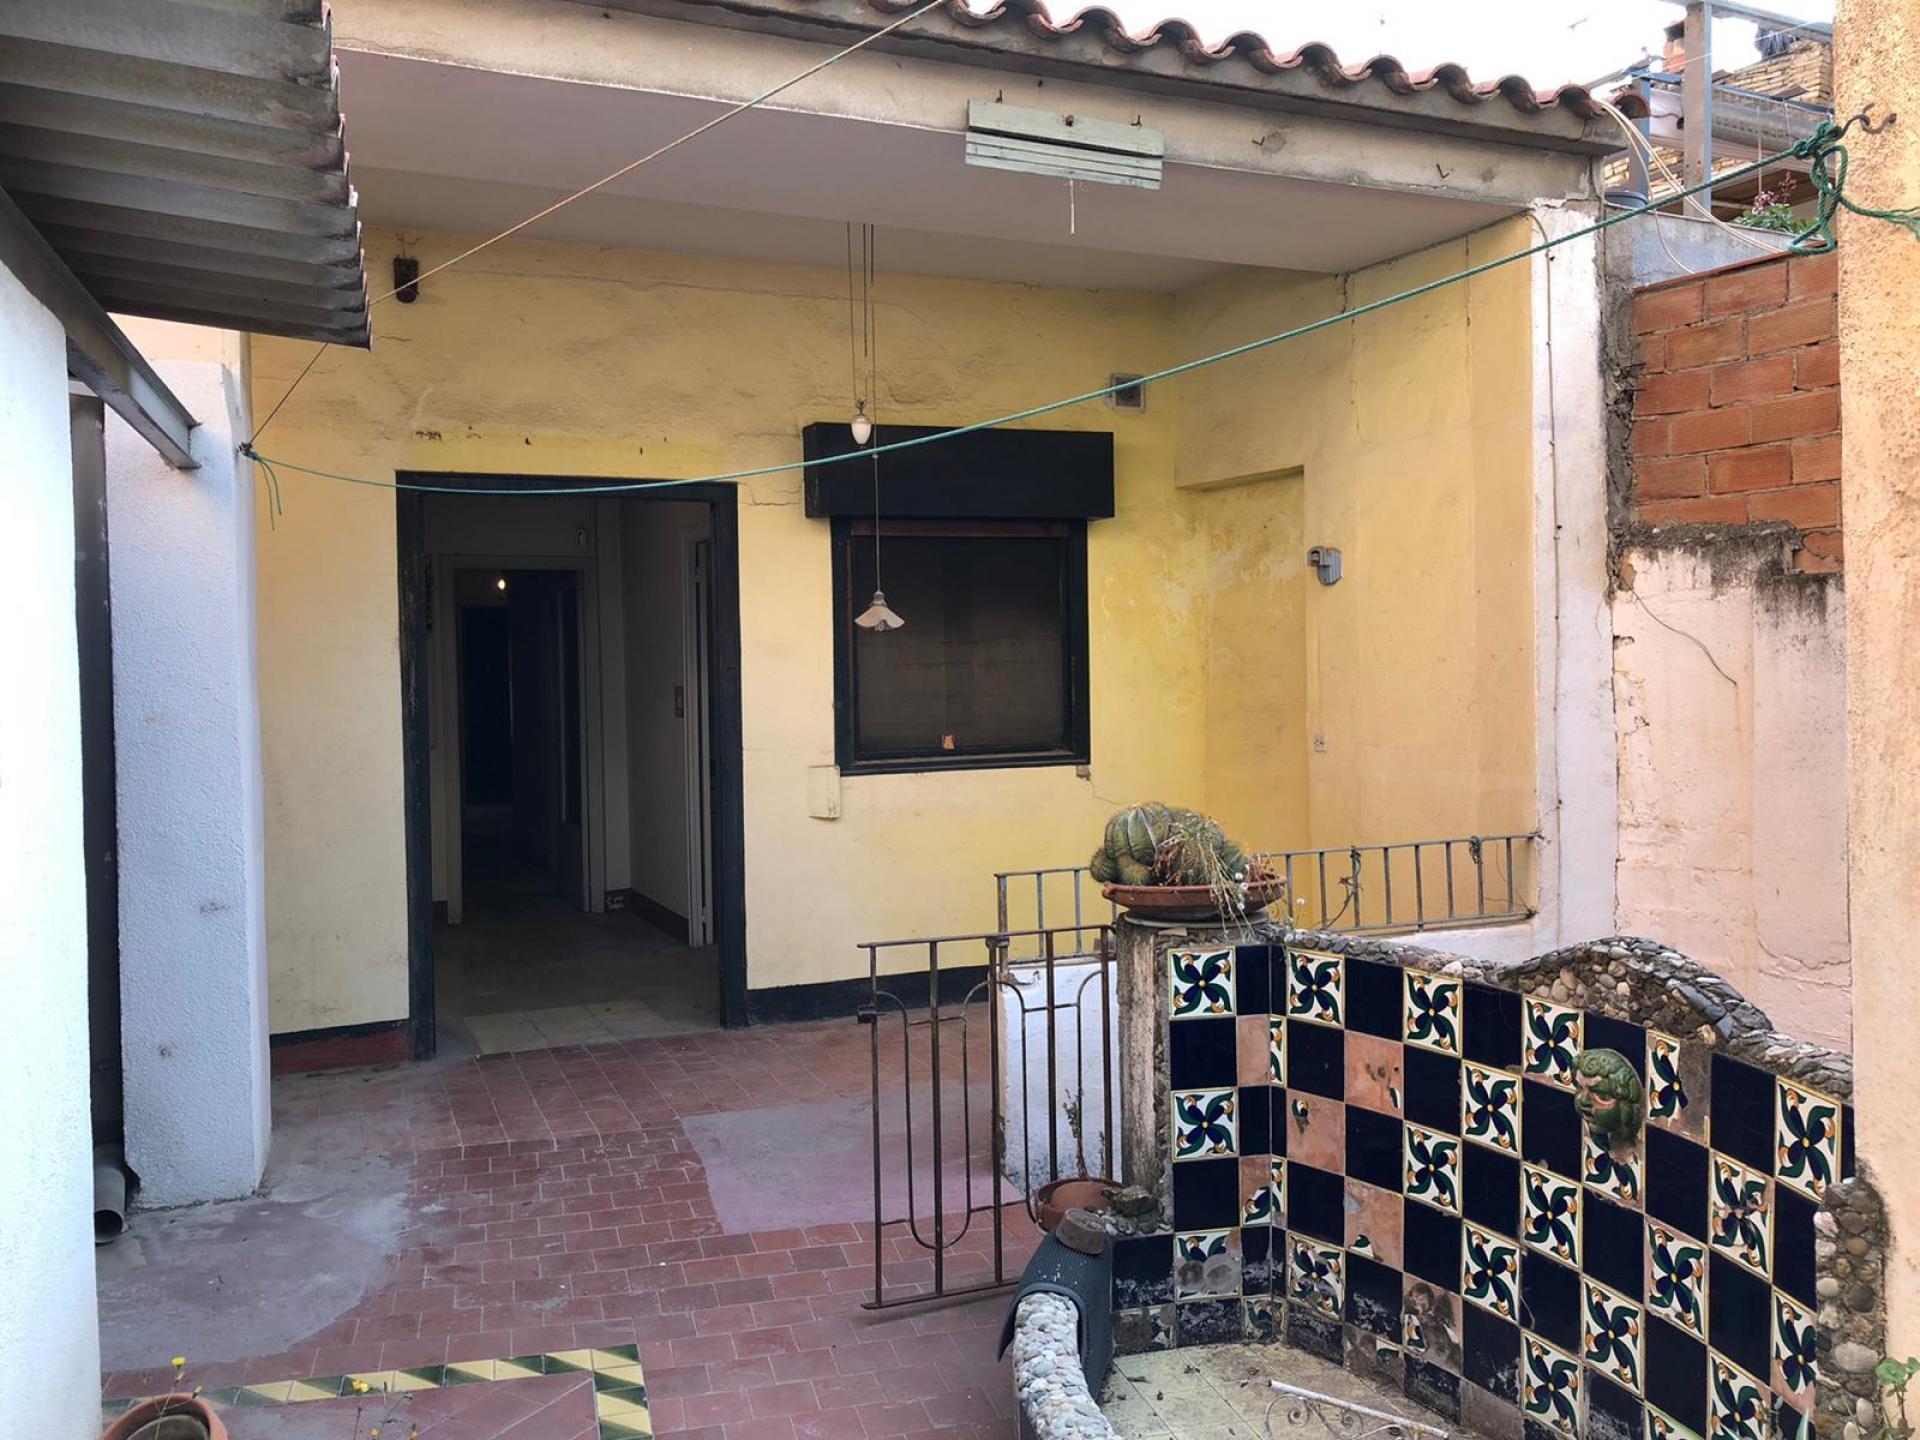 Foto 15 (V-727-2021) - Inmueble en  Venda a Sant Julià, Calle oriol , 15, Vilafranca del Penedès